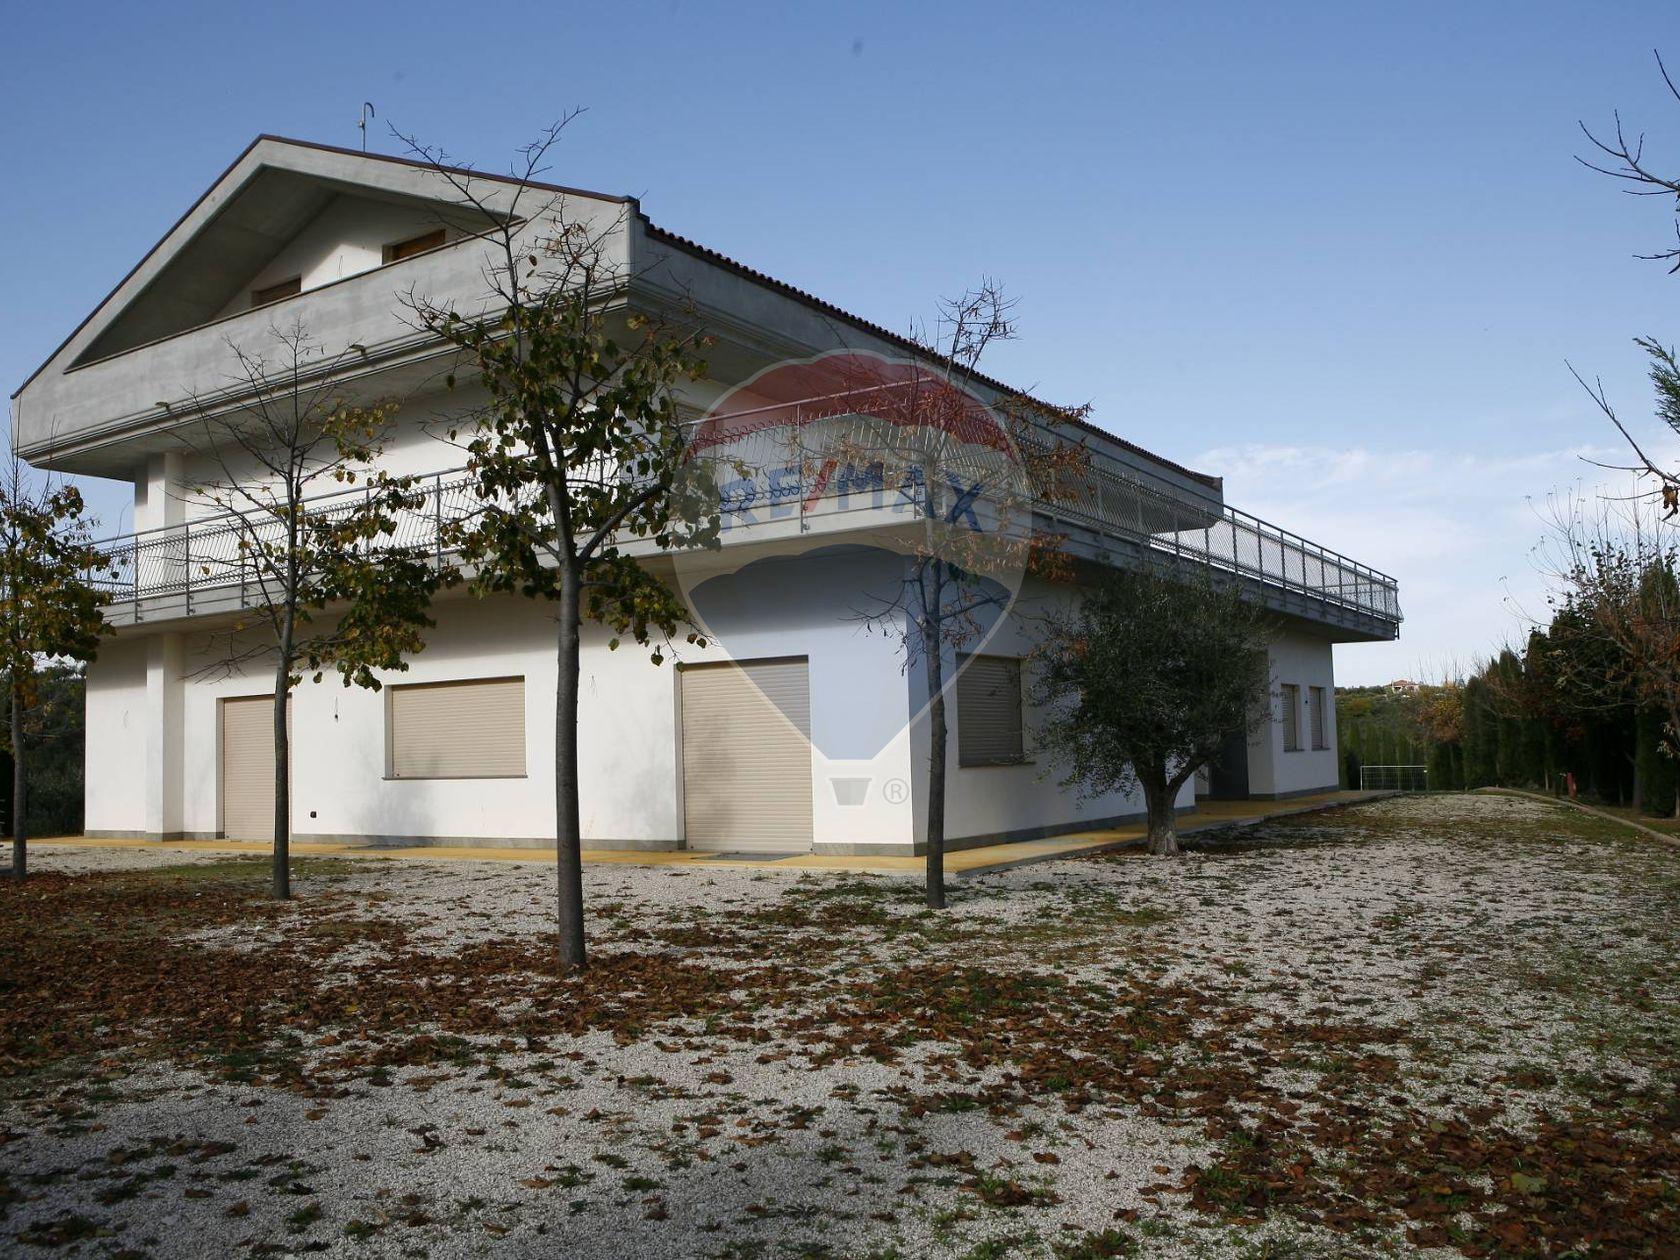 Casa Indipendente Senarica-Vertilina, Moscufo, PE Vendita - Foto 11